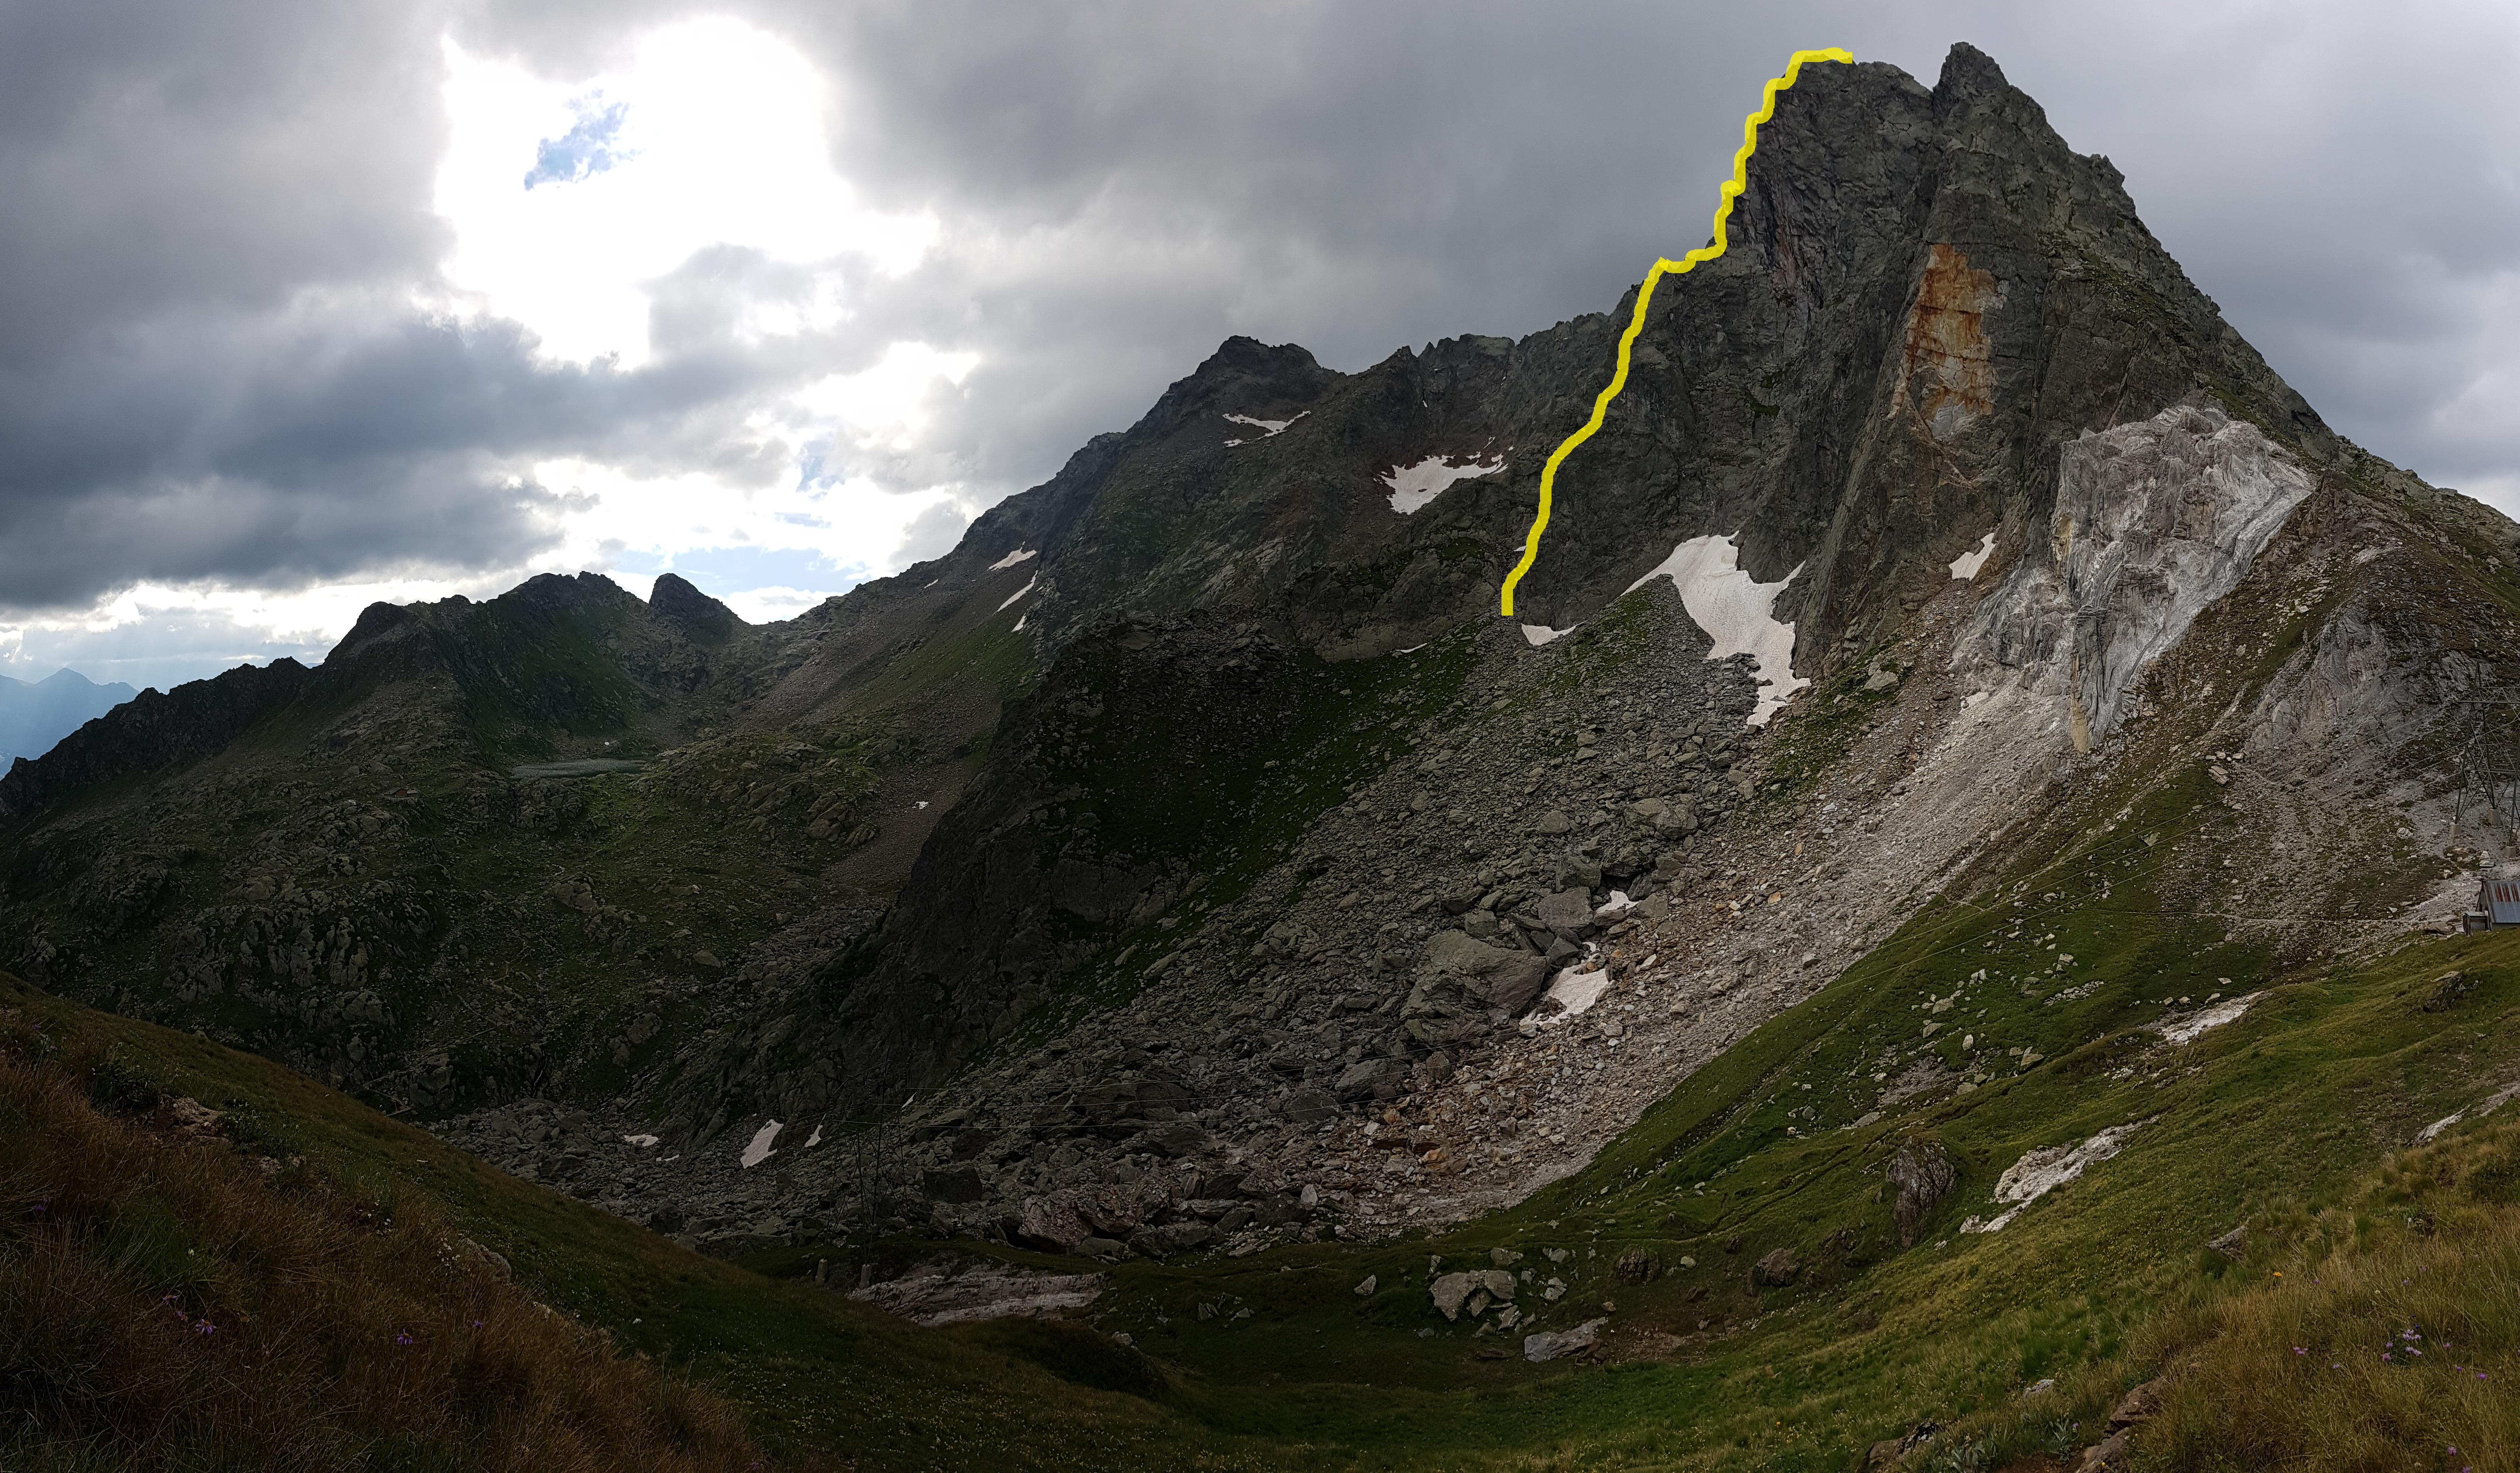 18PilierENthe_ClimbingRoute